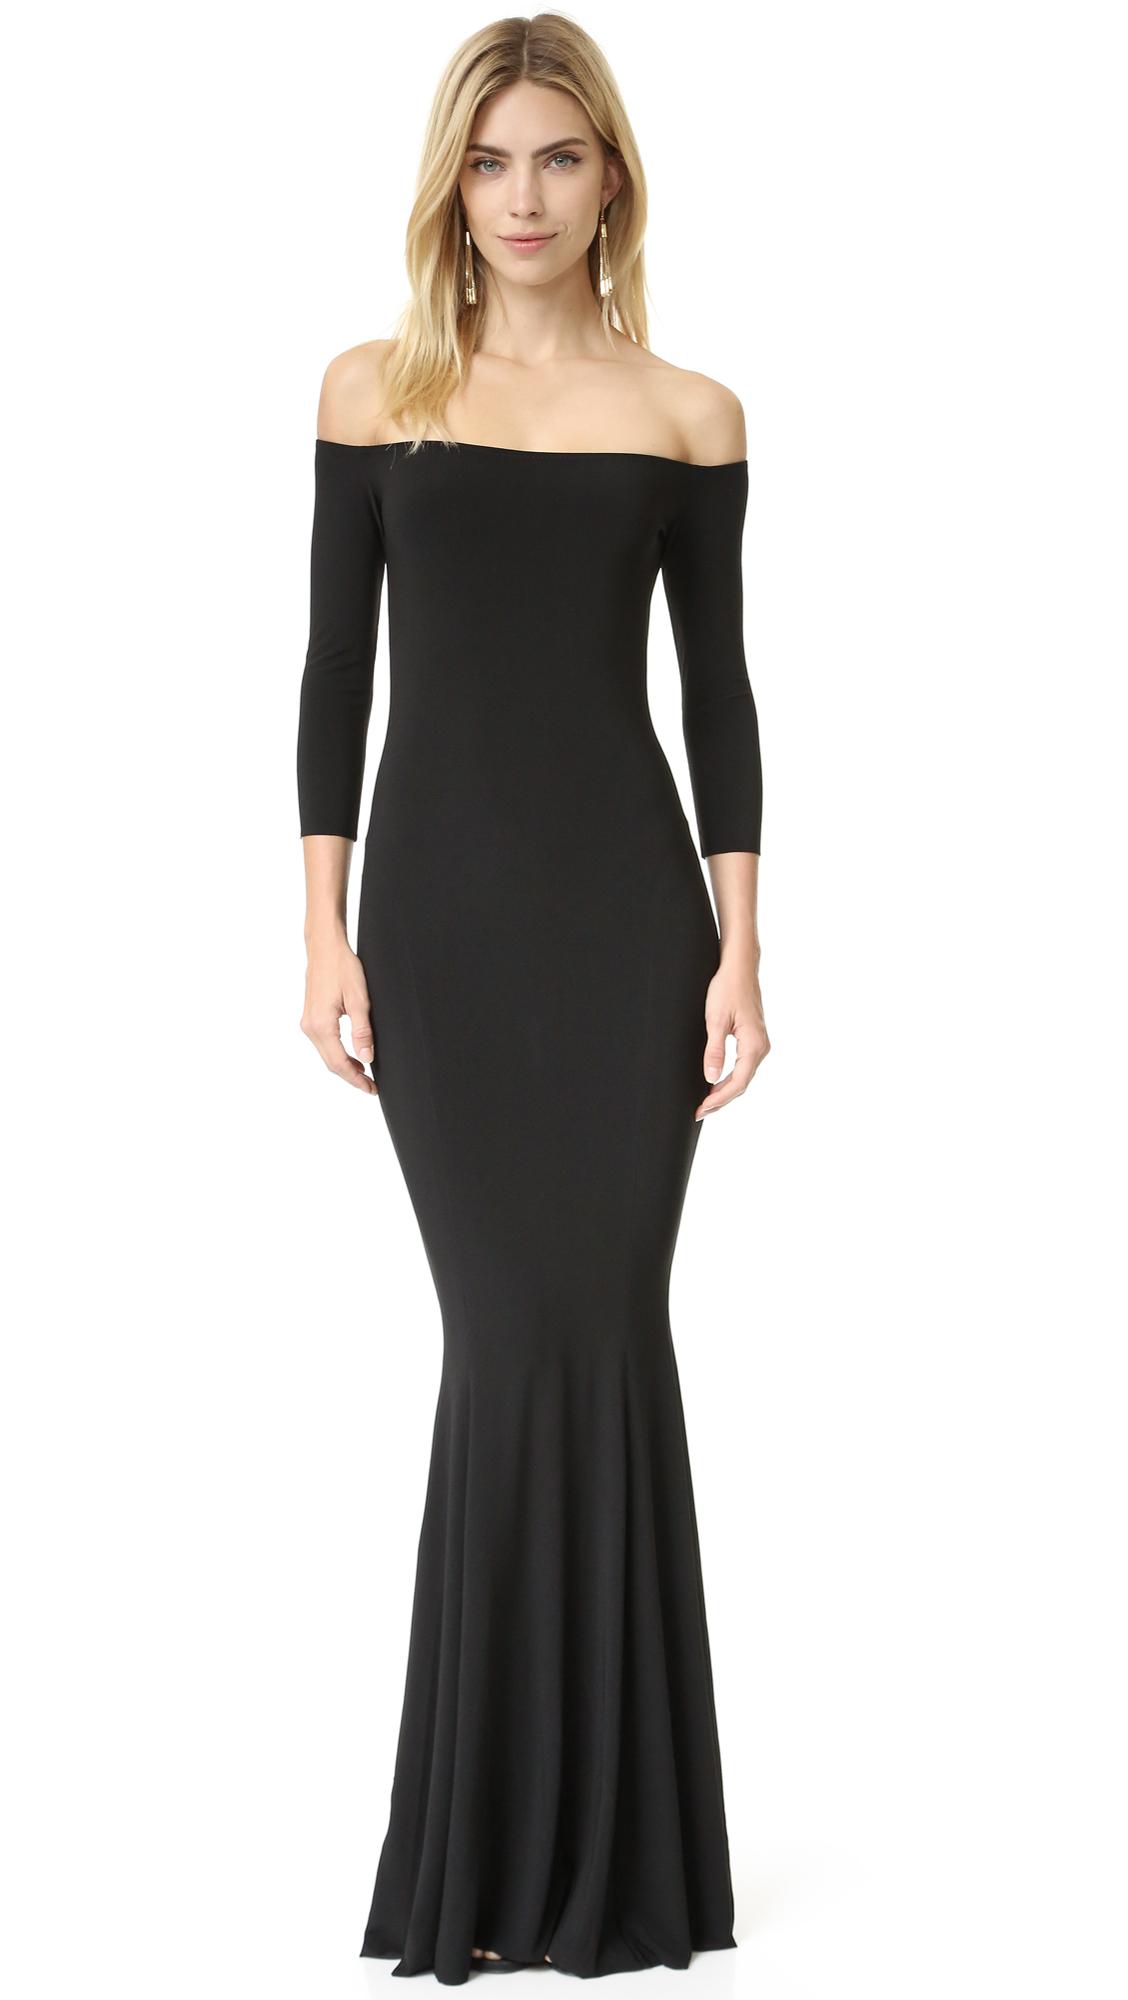 Norma Kamali Kamali Kulture Off Shoulder Fishtail Gown - Black